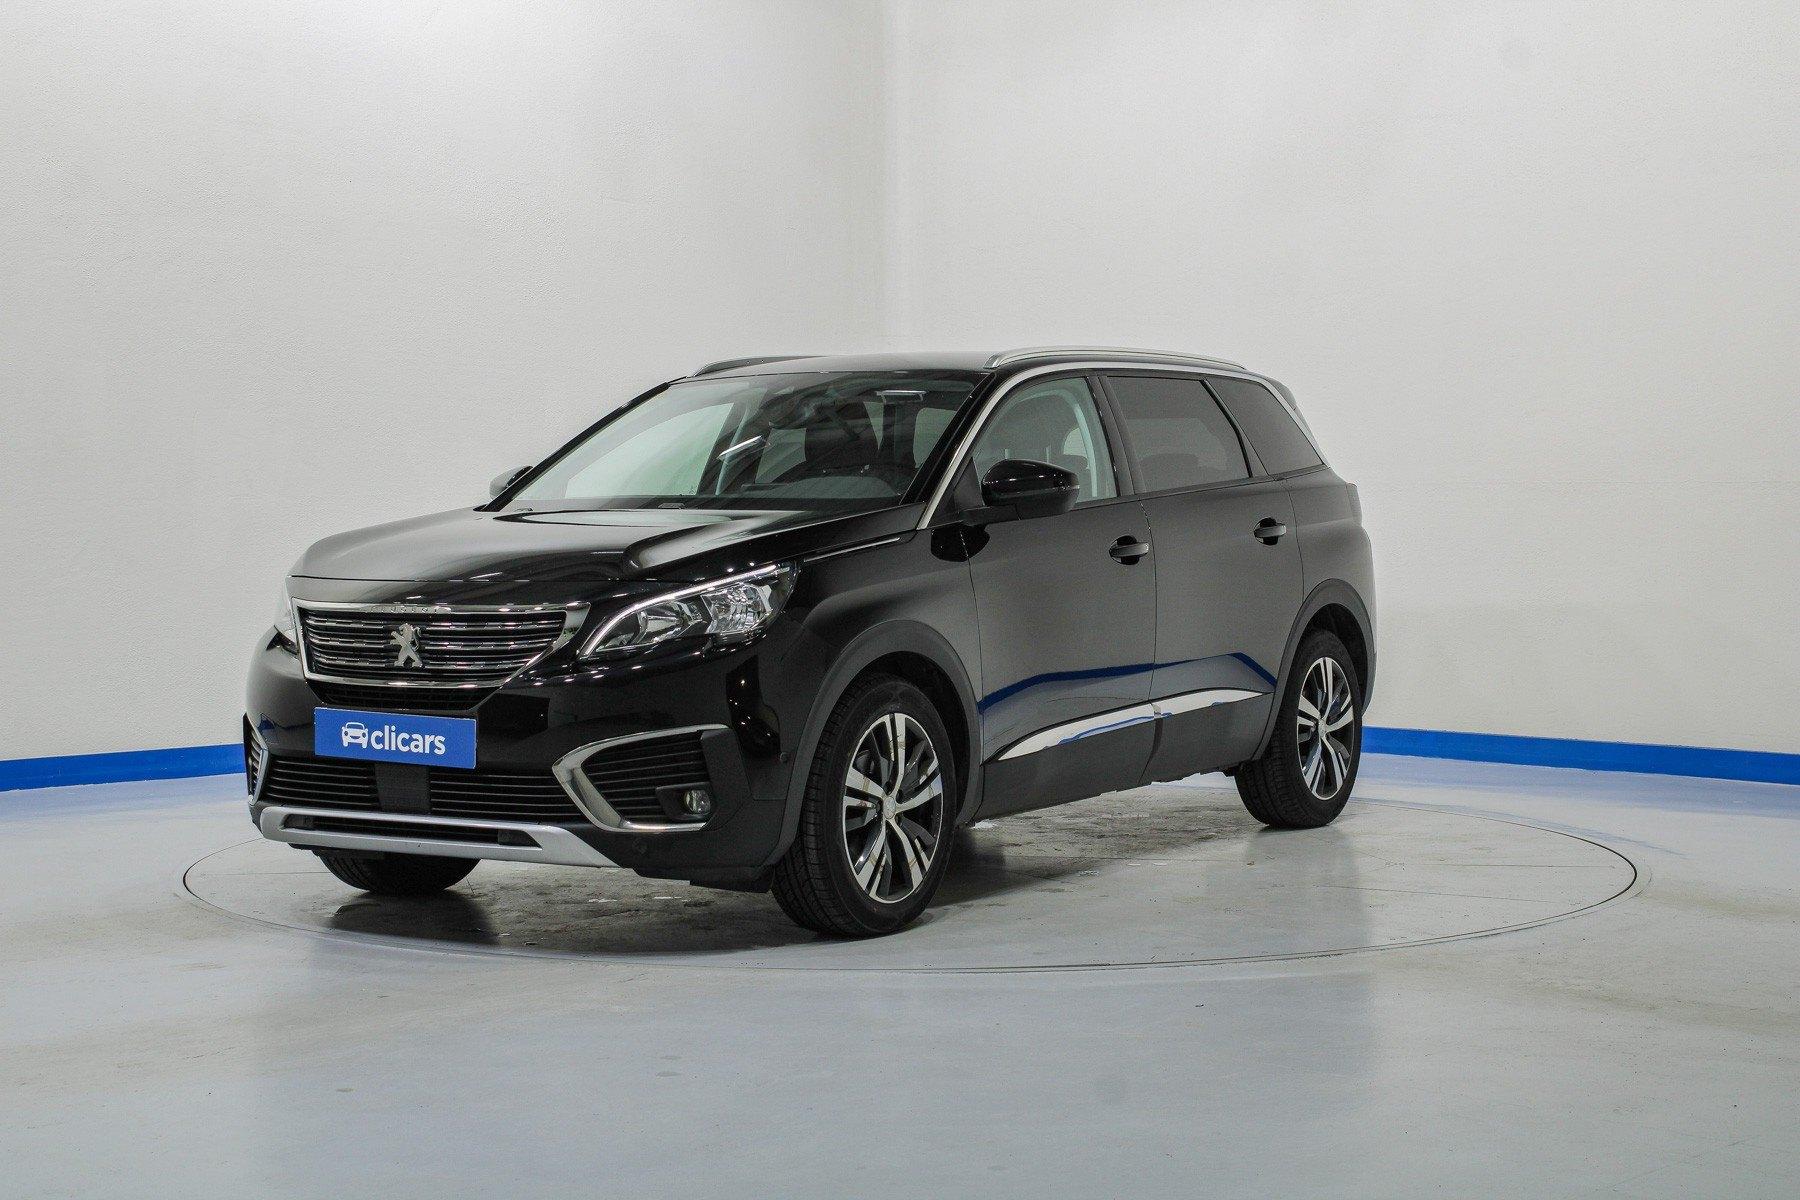 Peugeot 5008 Diésel Allure 1.5L BlueHDi 96kW (130CV) S&S 1